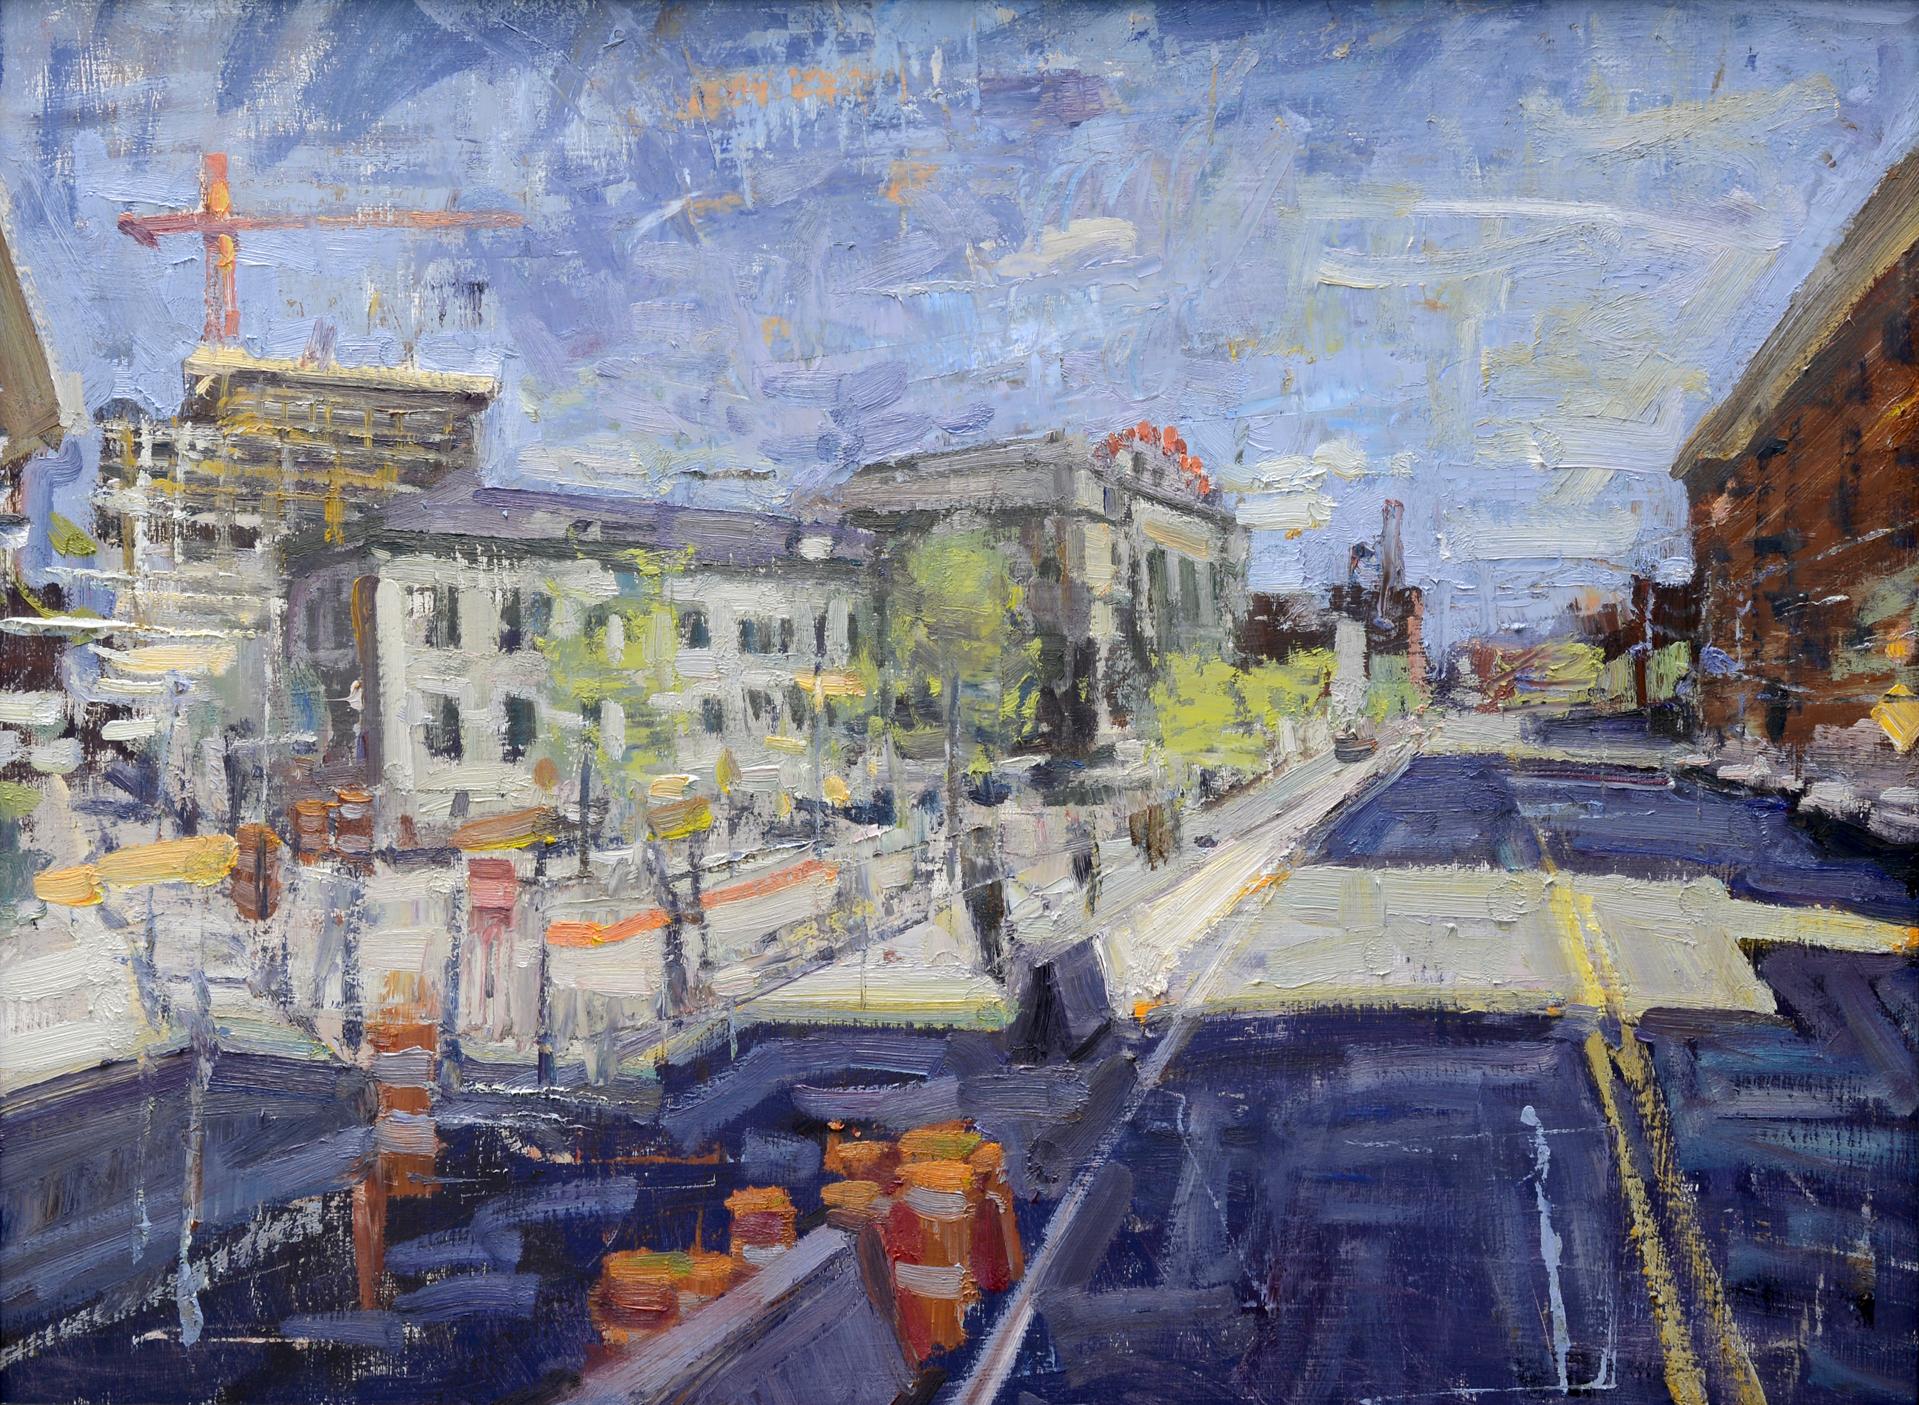 Union Station by Jim Beckner